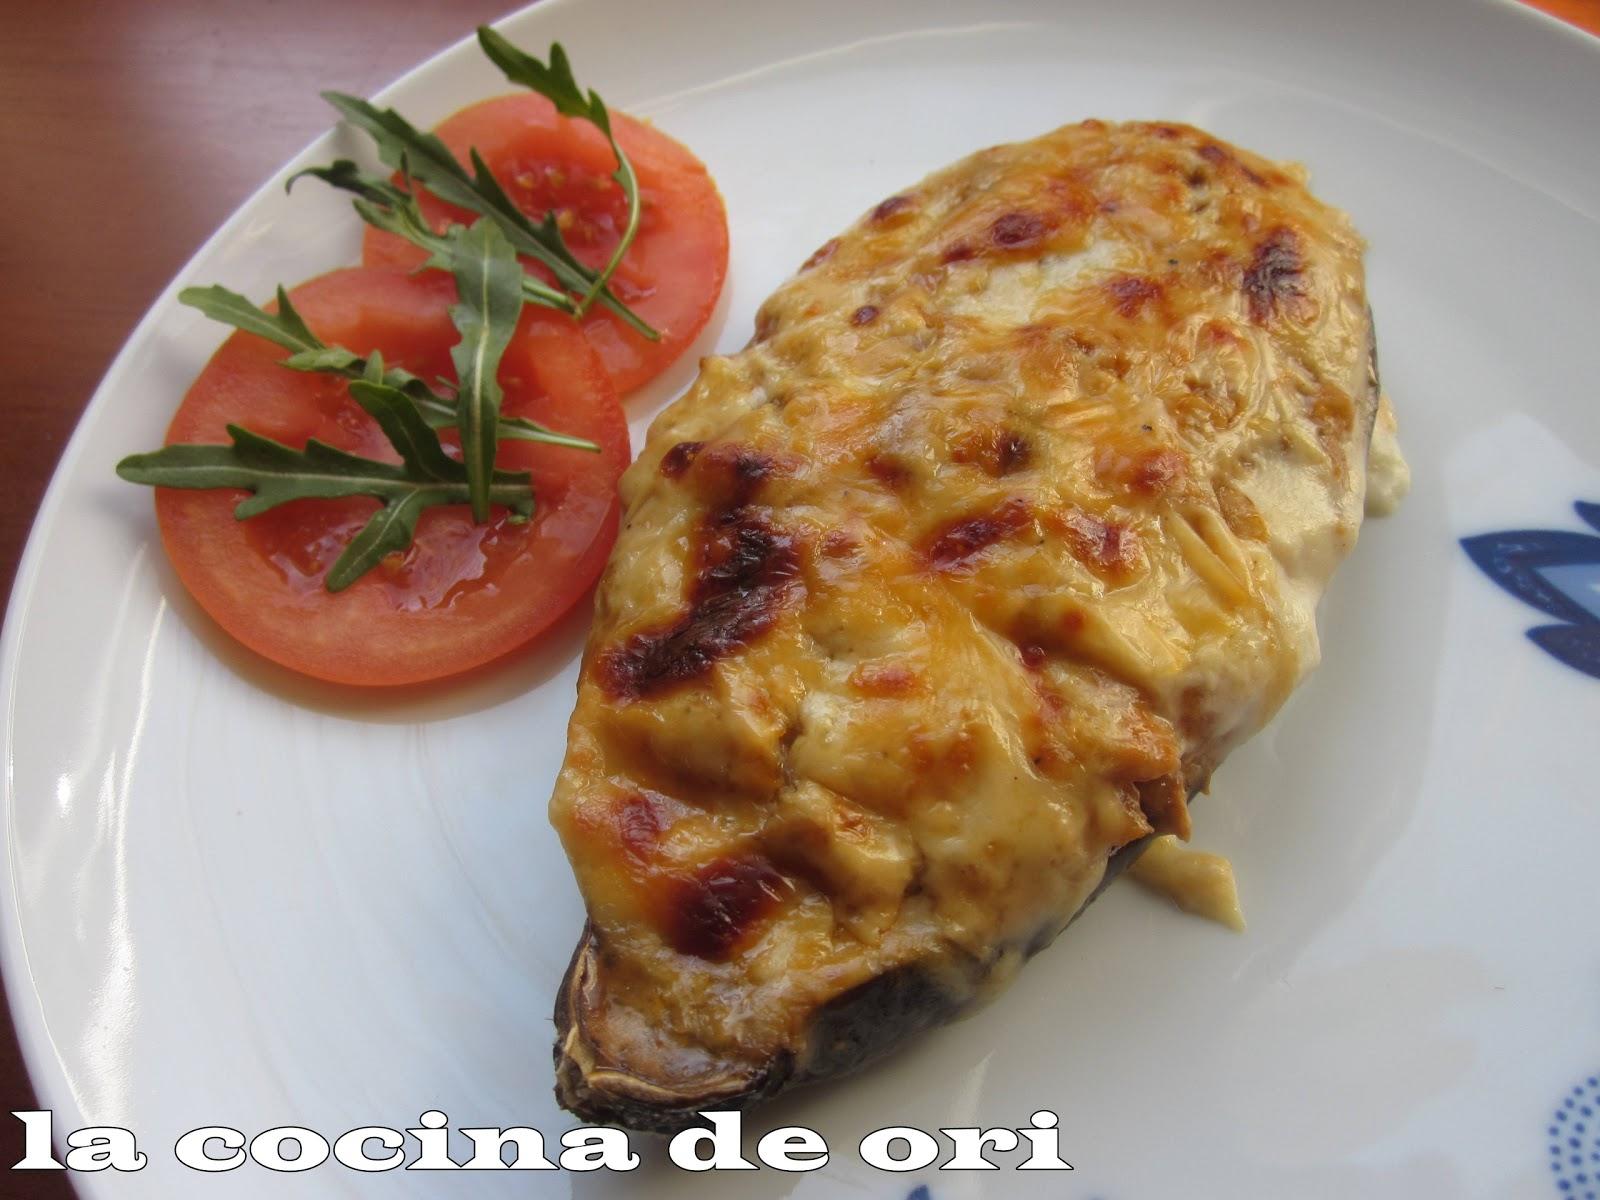 La cocina de ori berenjenas rellenas de atun for Cocina berenjenas rellenas